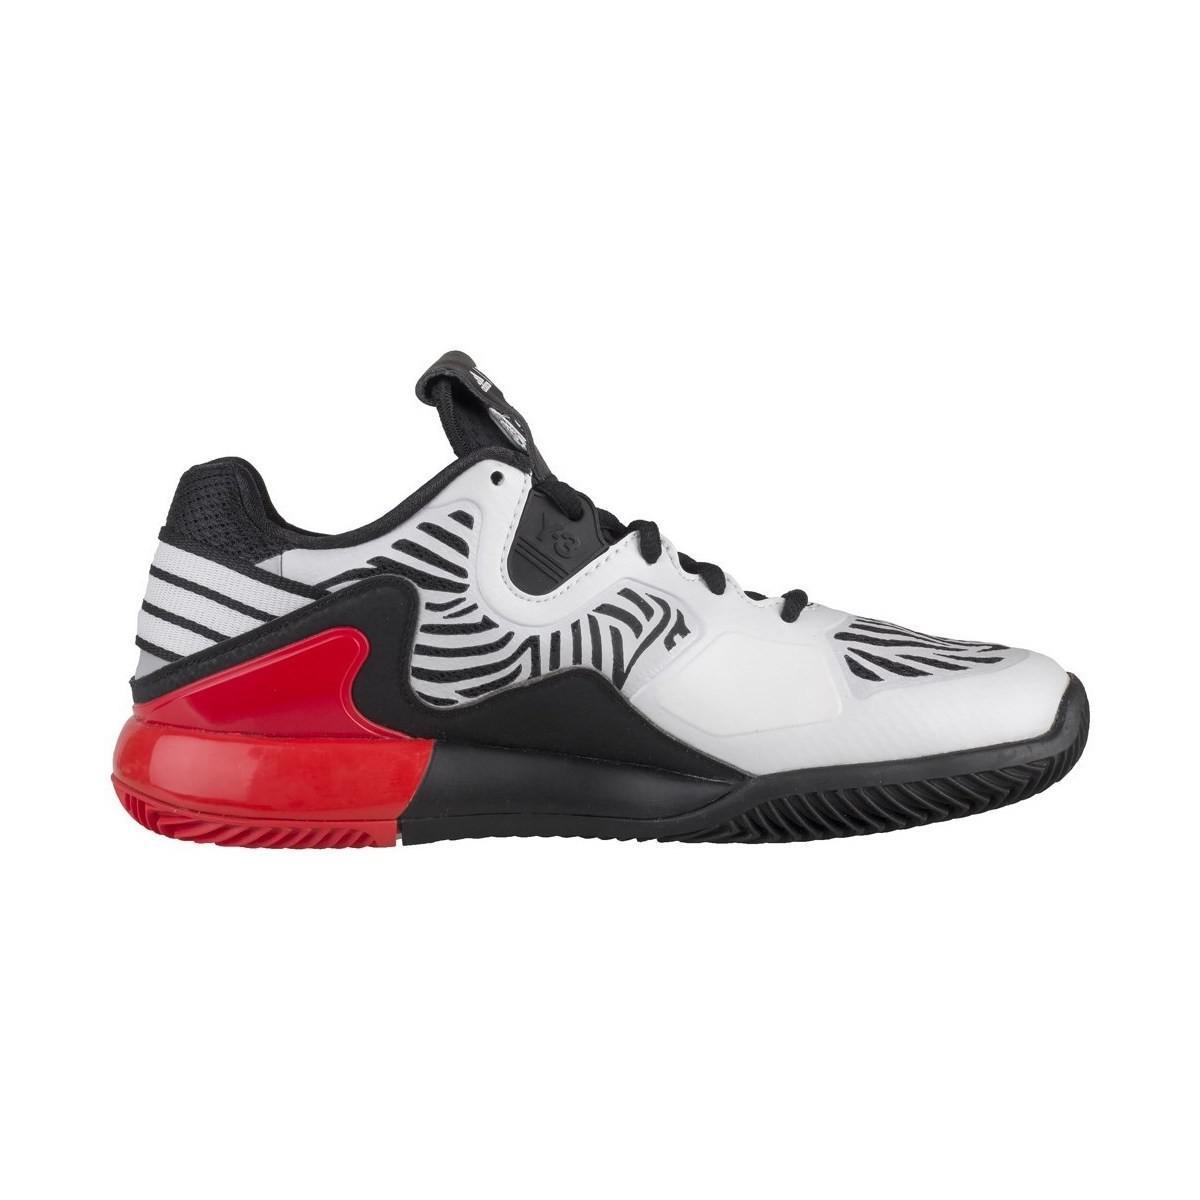 adidas Adizero Y3 2016 W Women s Shoes (trainers) In Black in Black ... 820451133